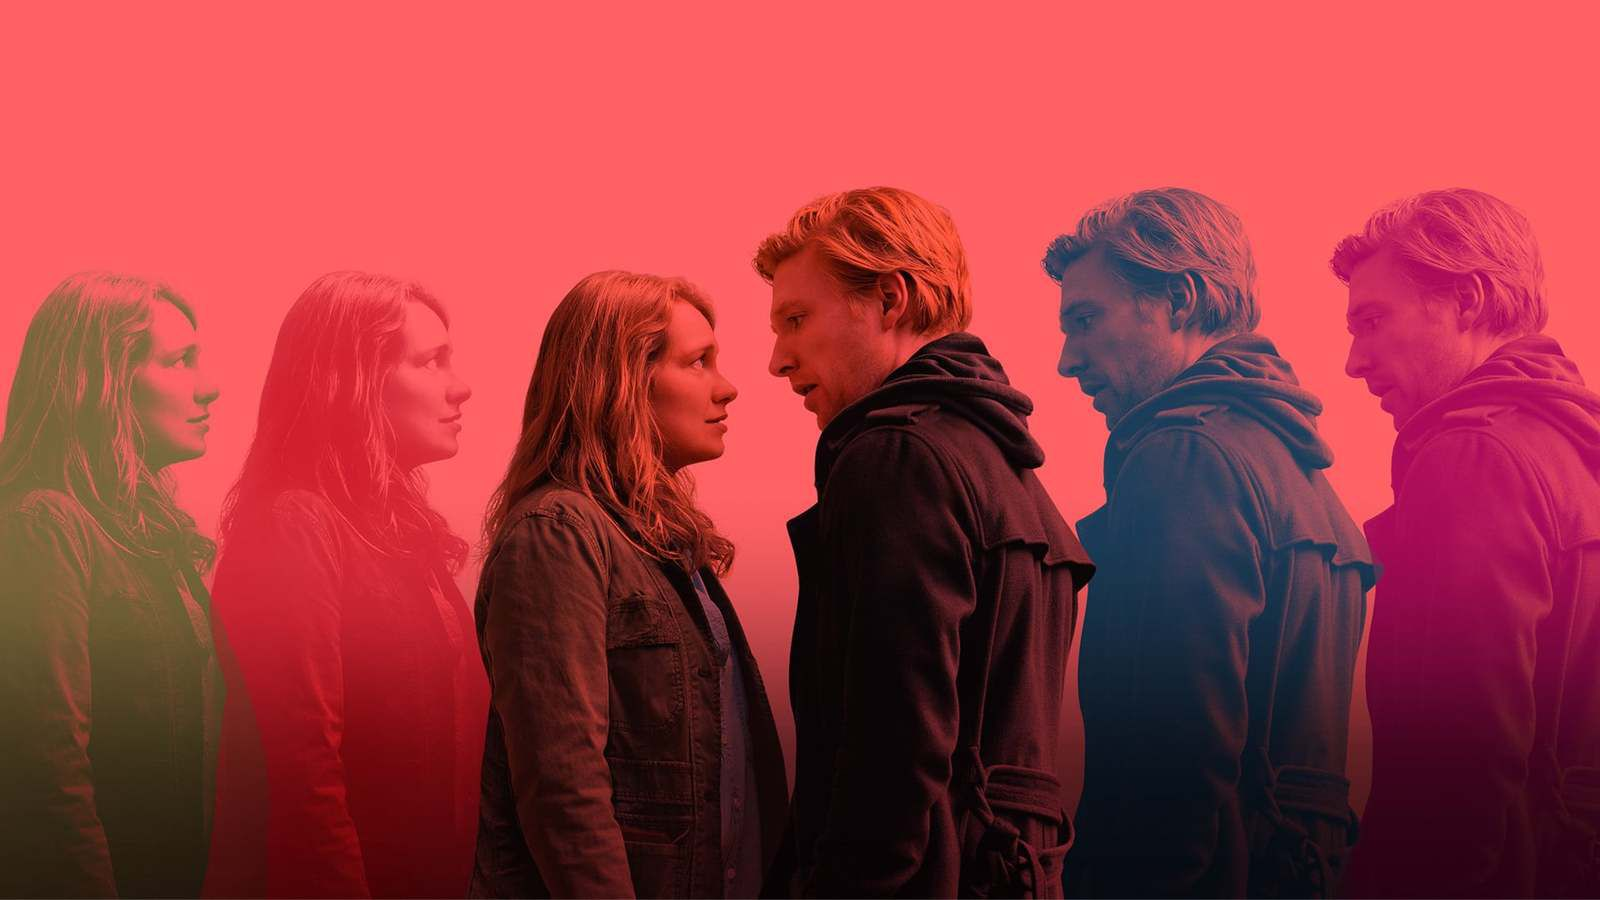 Ucieczka - serial HBO skasowany. The Moodys z 2. sezonem